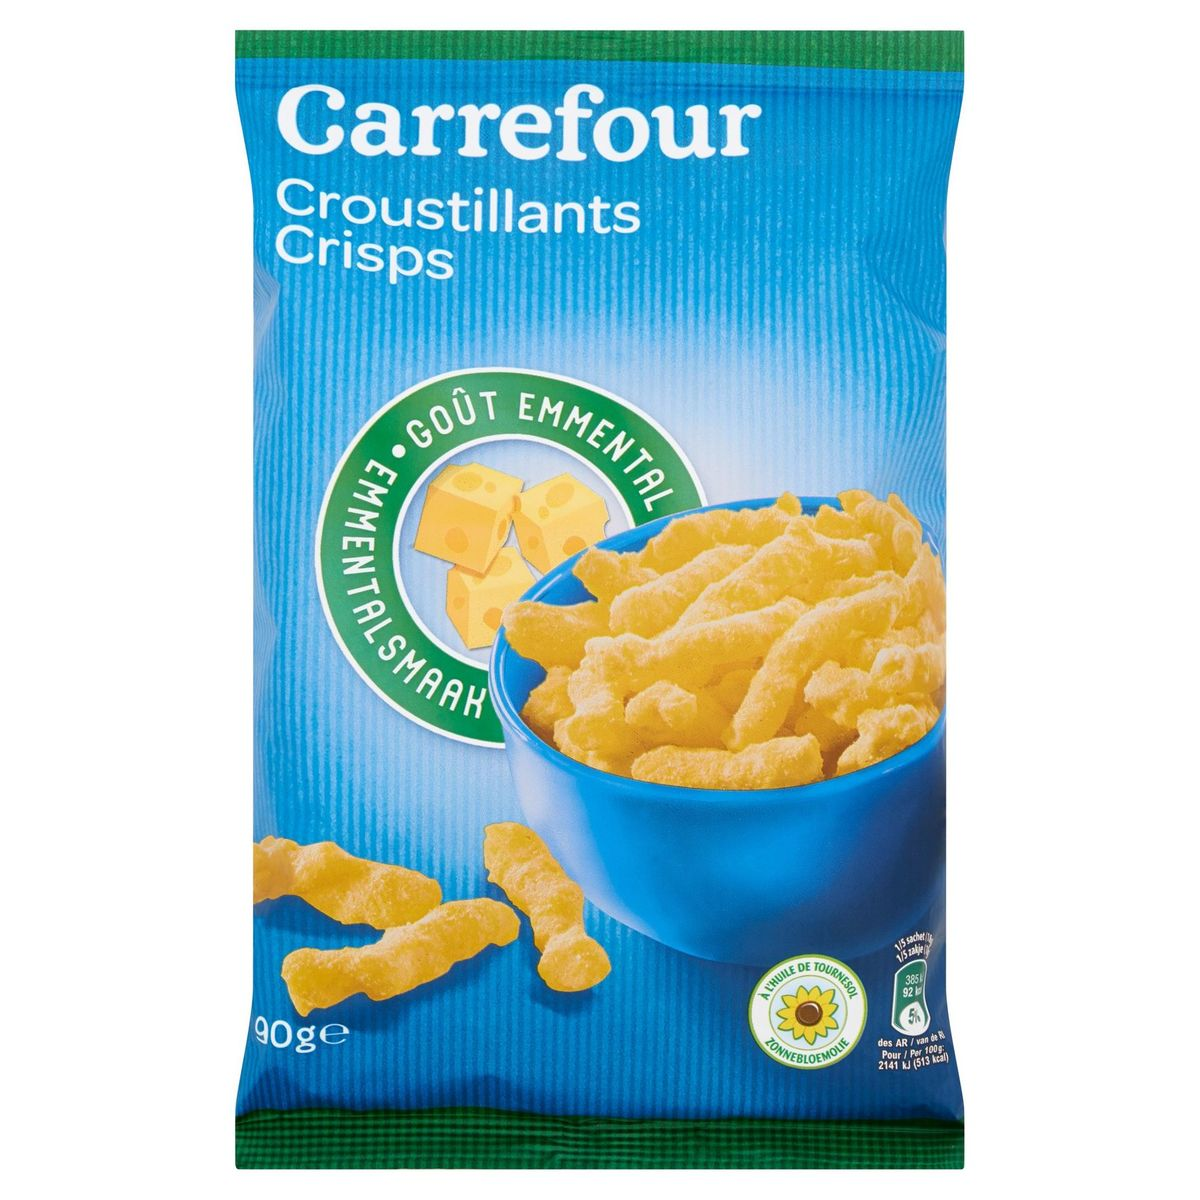 Carrefour Croustillants Goût Emmental 90 g